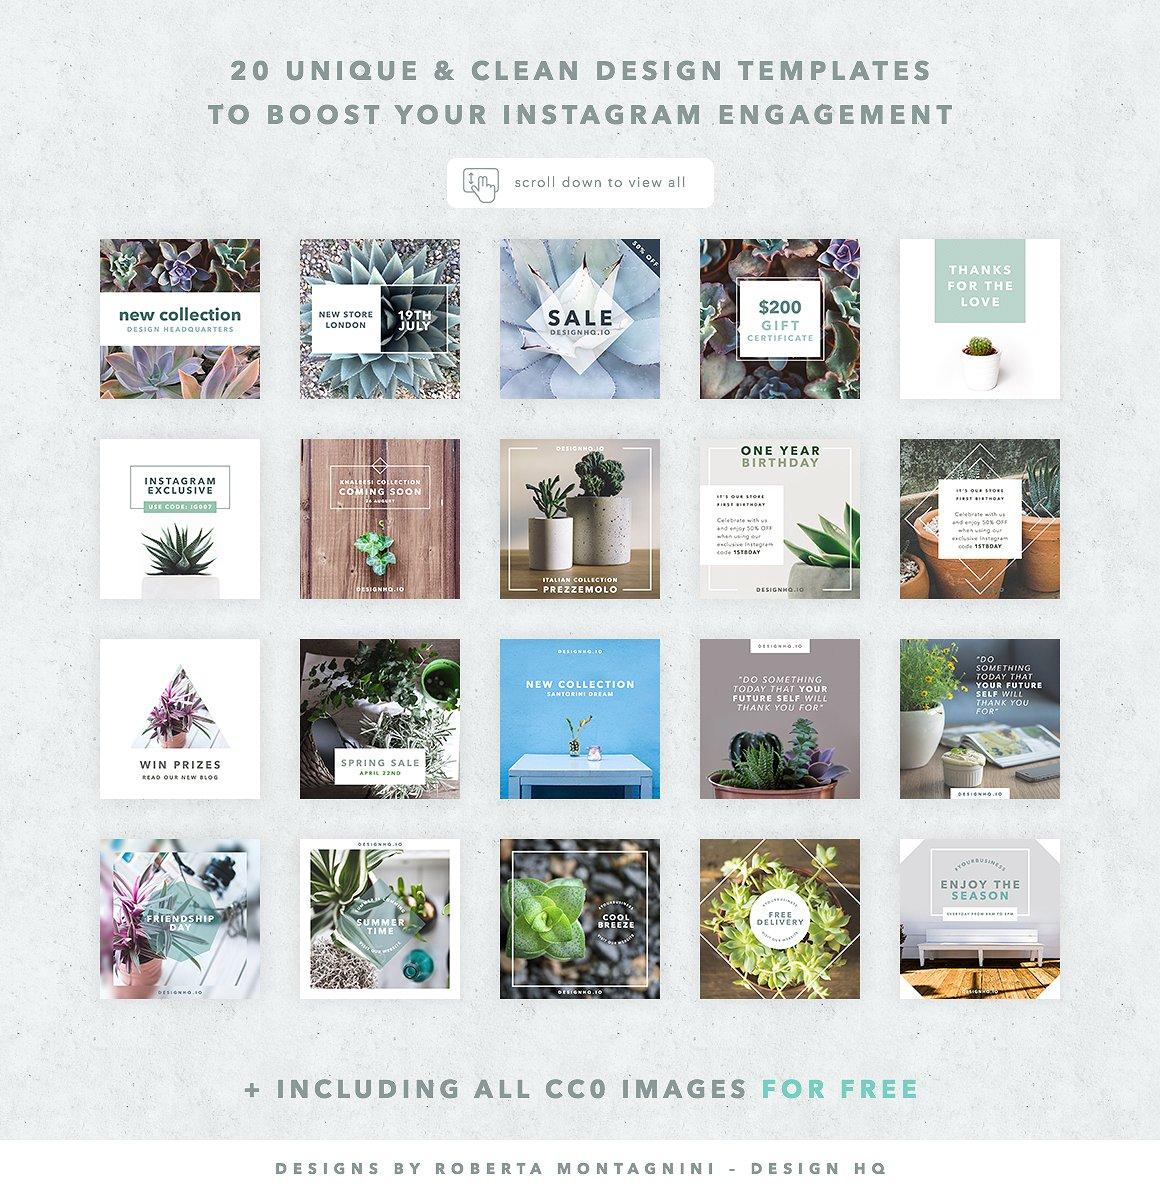 Instagram social media template clean design hq clean social media template bundle design hq maxwellsz